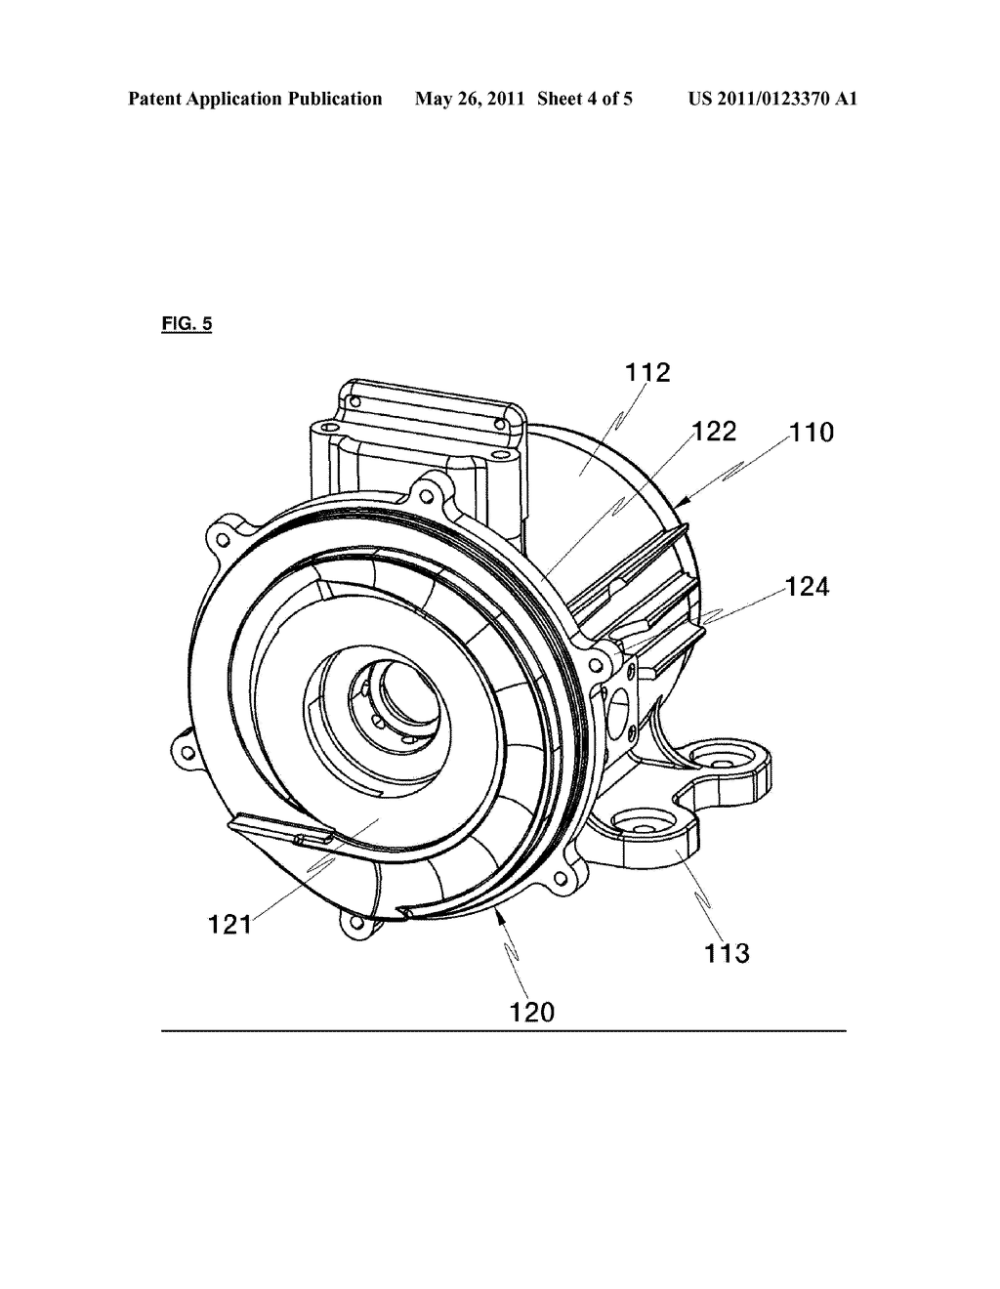 medium resolution of electric water pump diagram schematic and image 05 diaphragm pump diagram water pump diagram